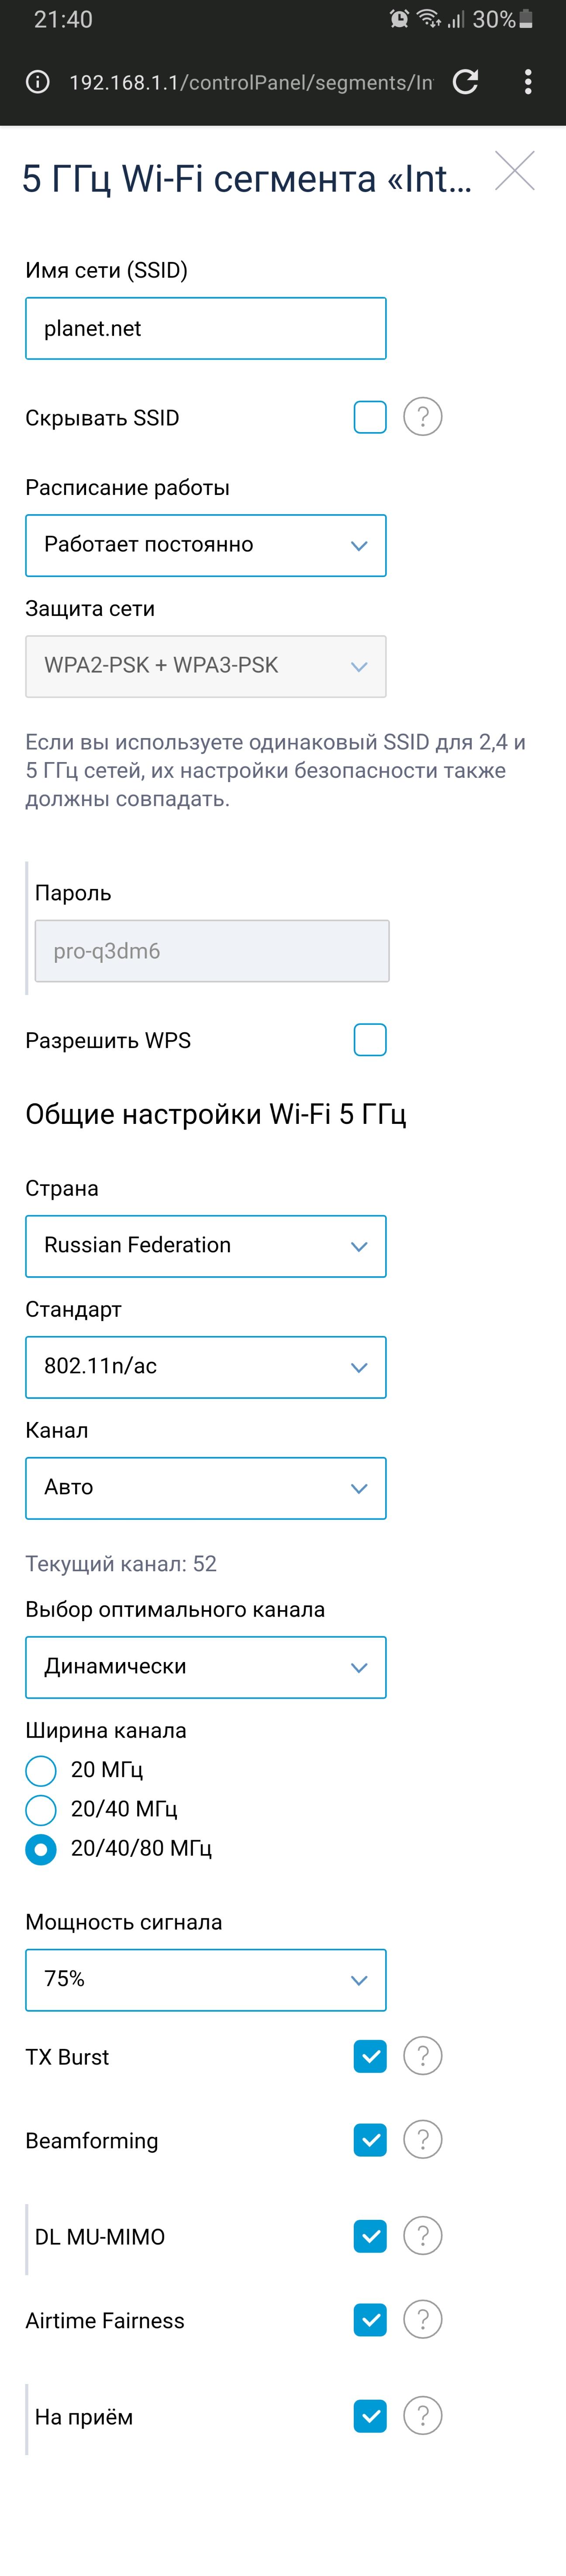 Screenshot_20210816-214013_Opera.jpg